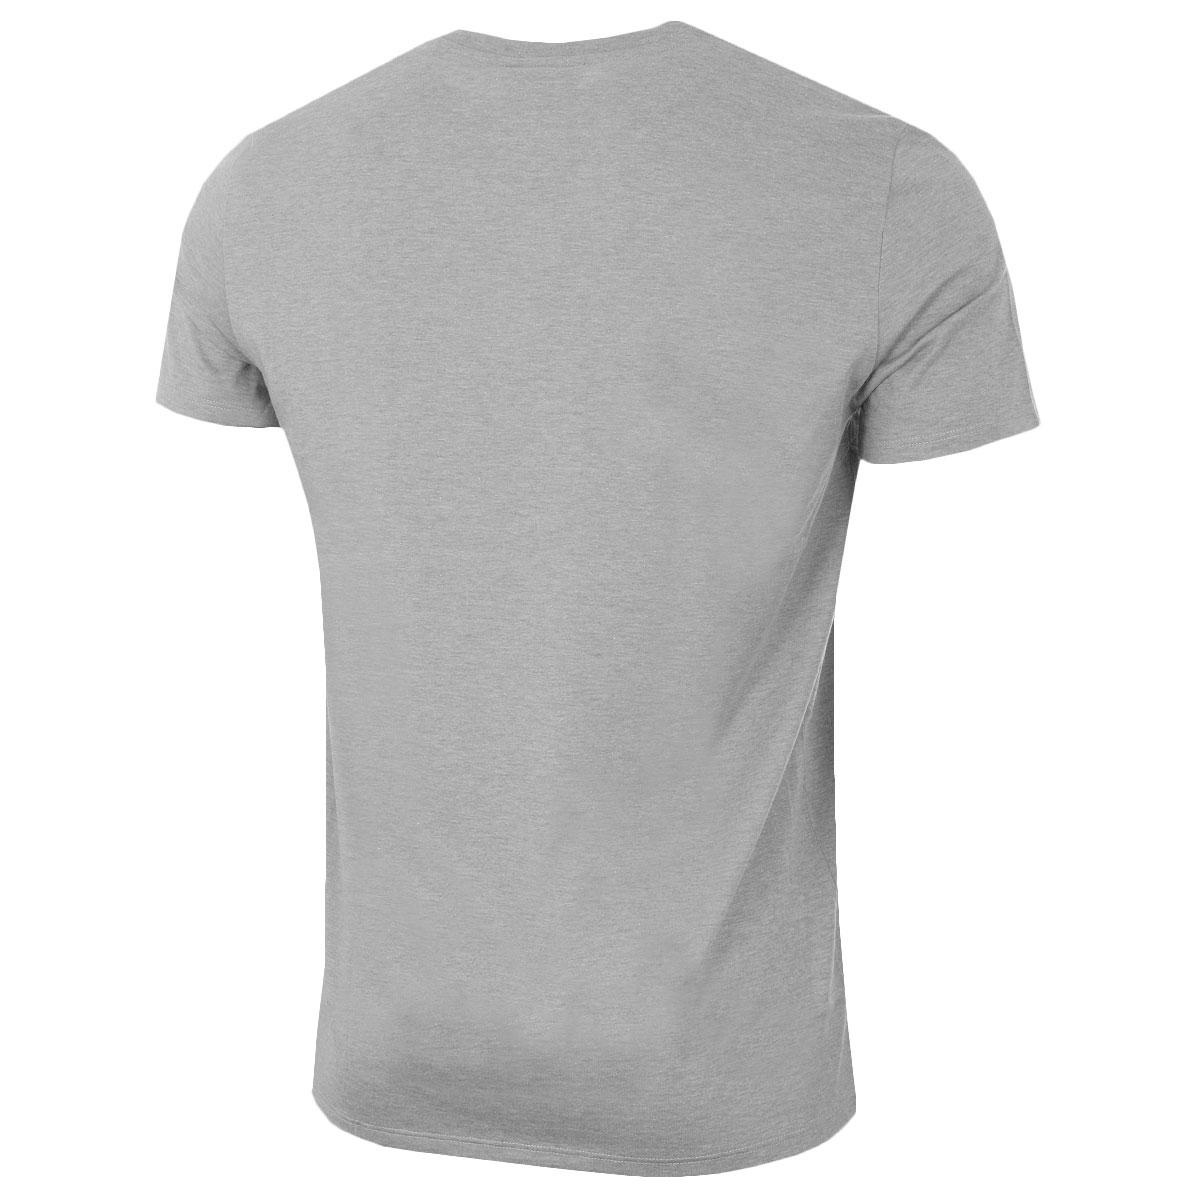 Lacoste-Mens-2019-SS-V-Neck-TH6710-Short-Sleeve-Pima-Cotton-Tee-T-Shirt thumbnail 22